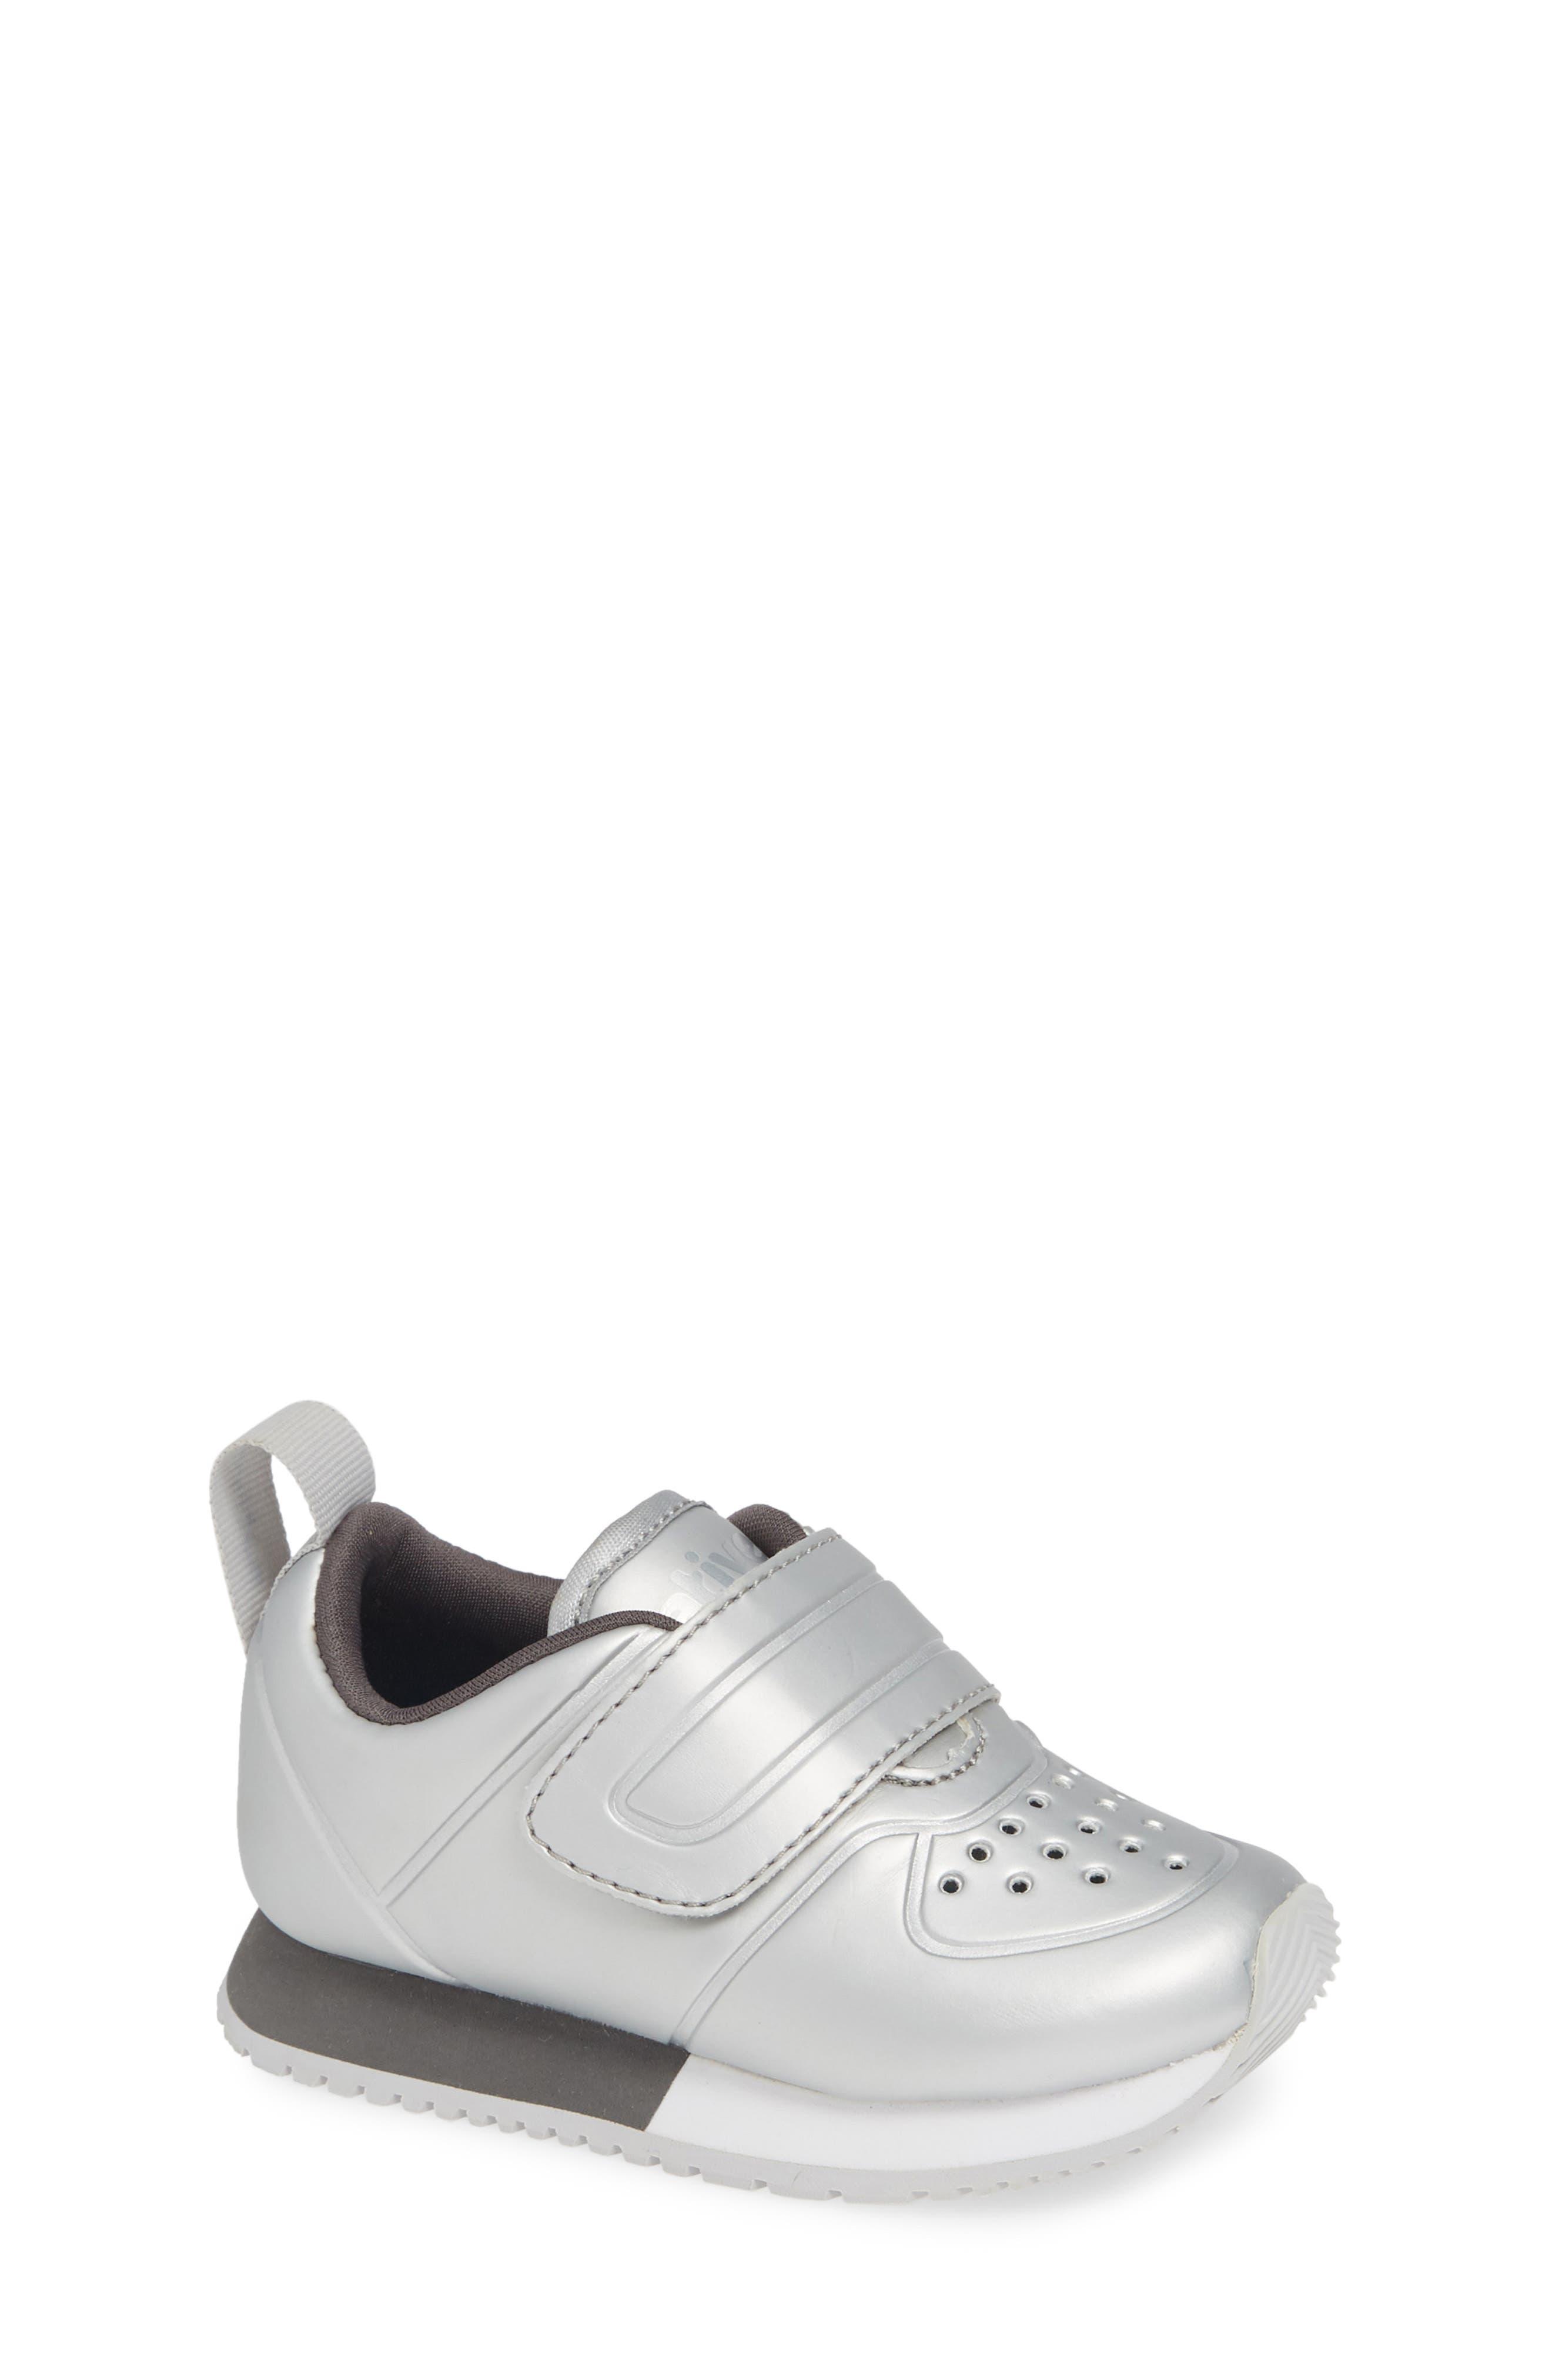 Cornell Perforated Metallic Sneaker,                         Main,                         color, SILVER/ WHITE/ DUBLIN GREY